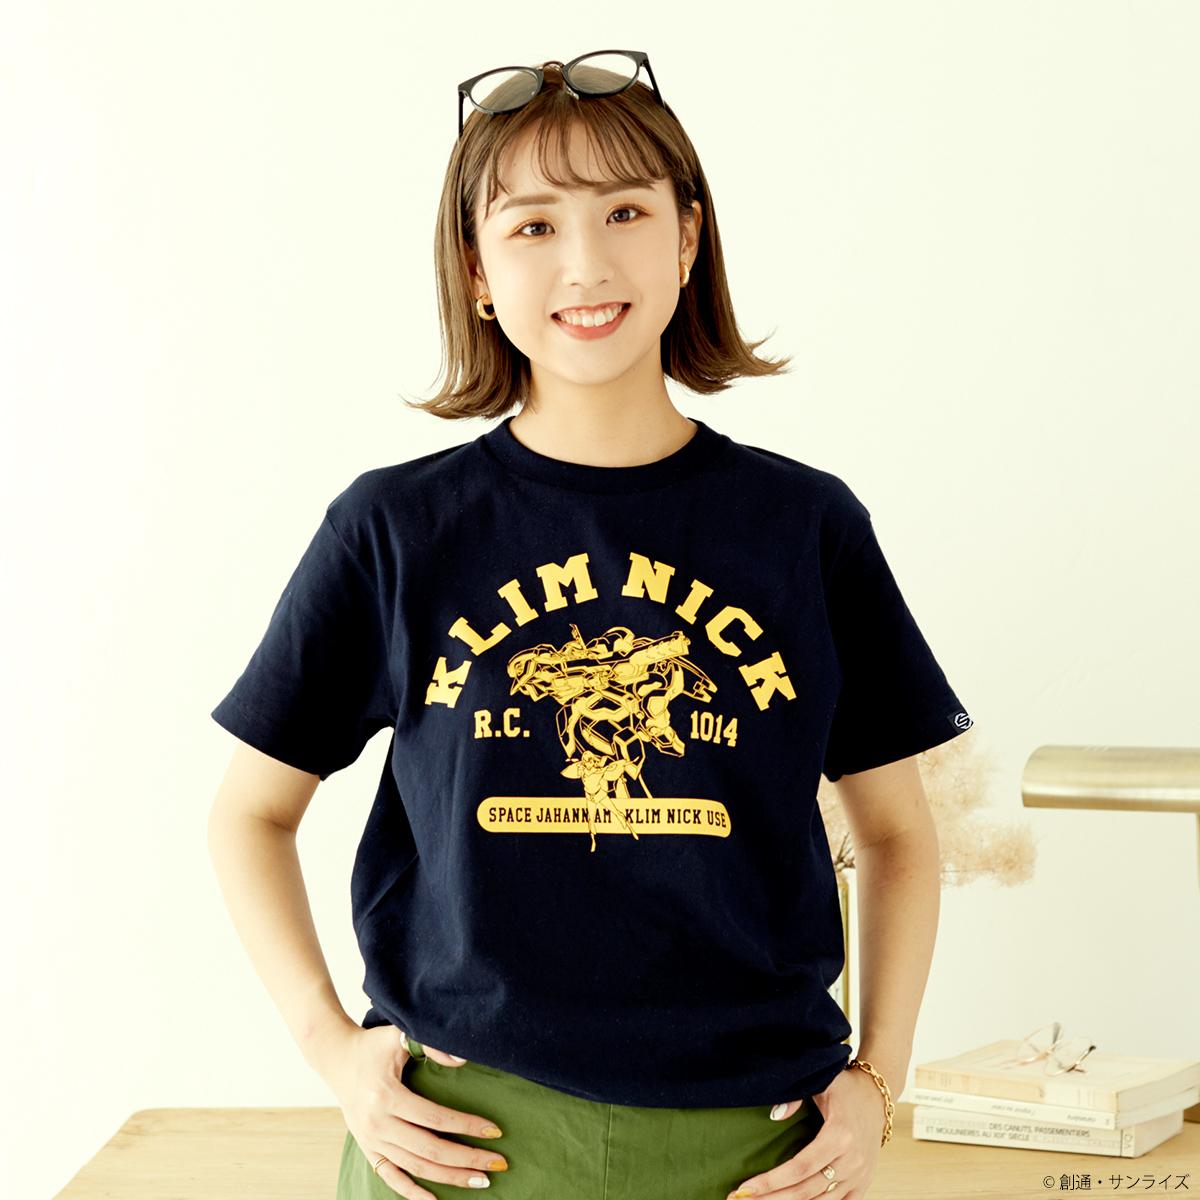 STRICT-G『Gのレコンギスタ』Tシャツ KLIM NICK